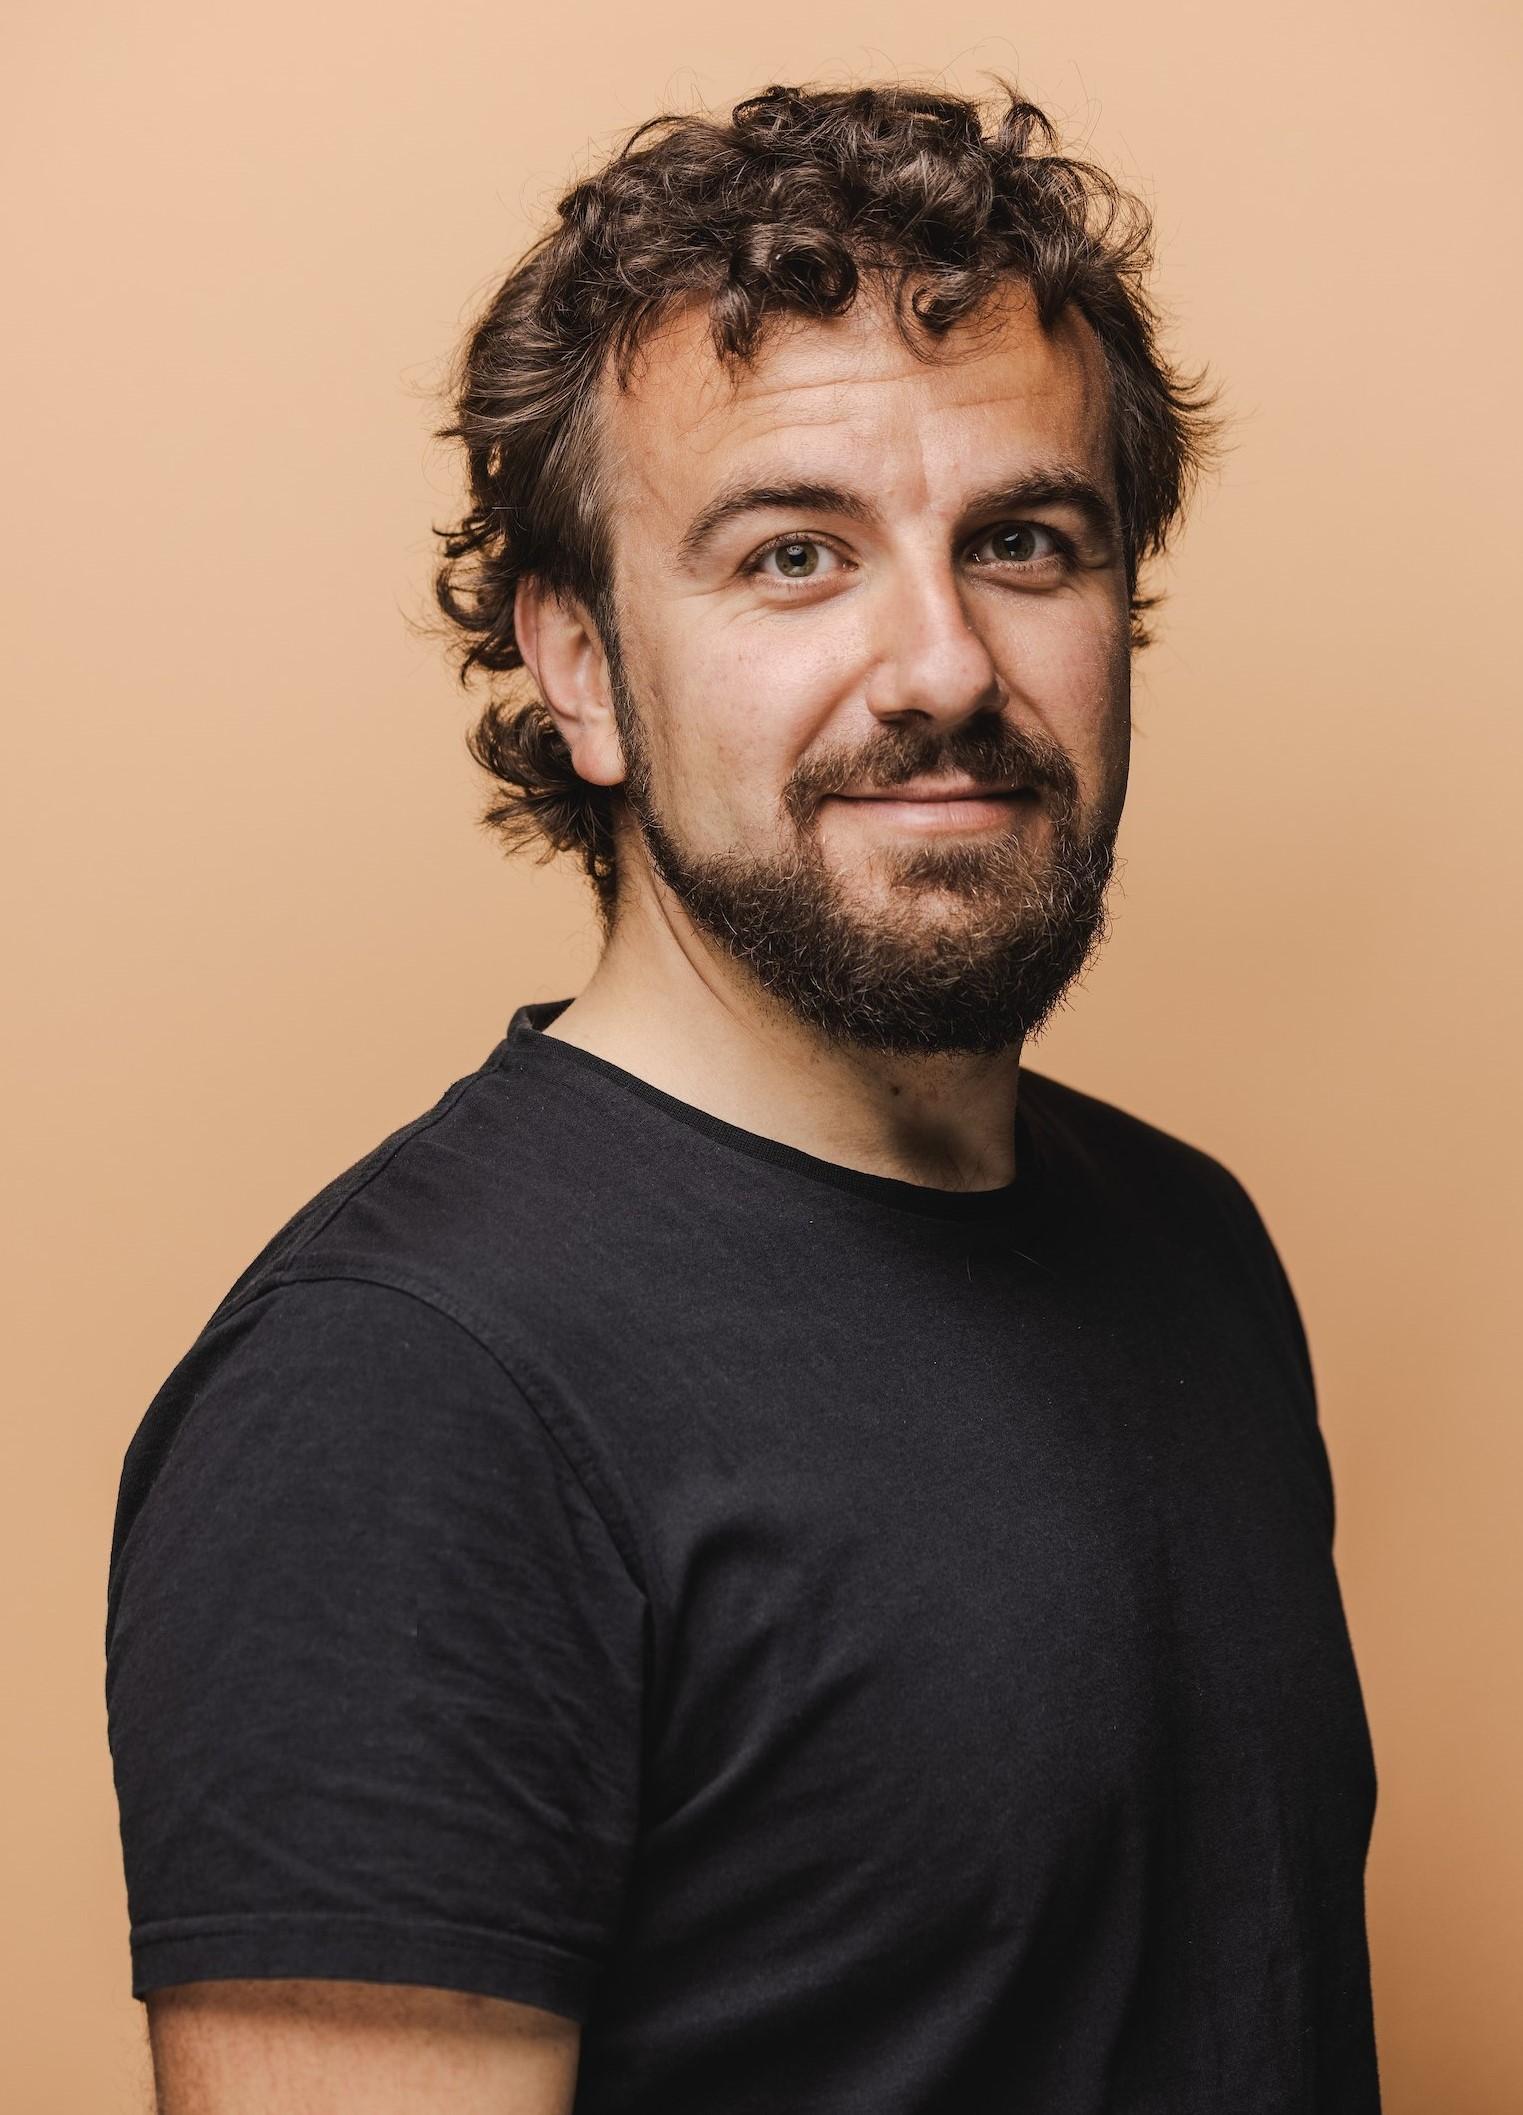 Gianluca Paglia